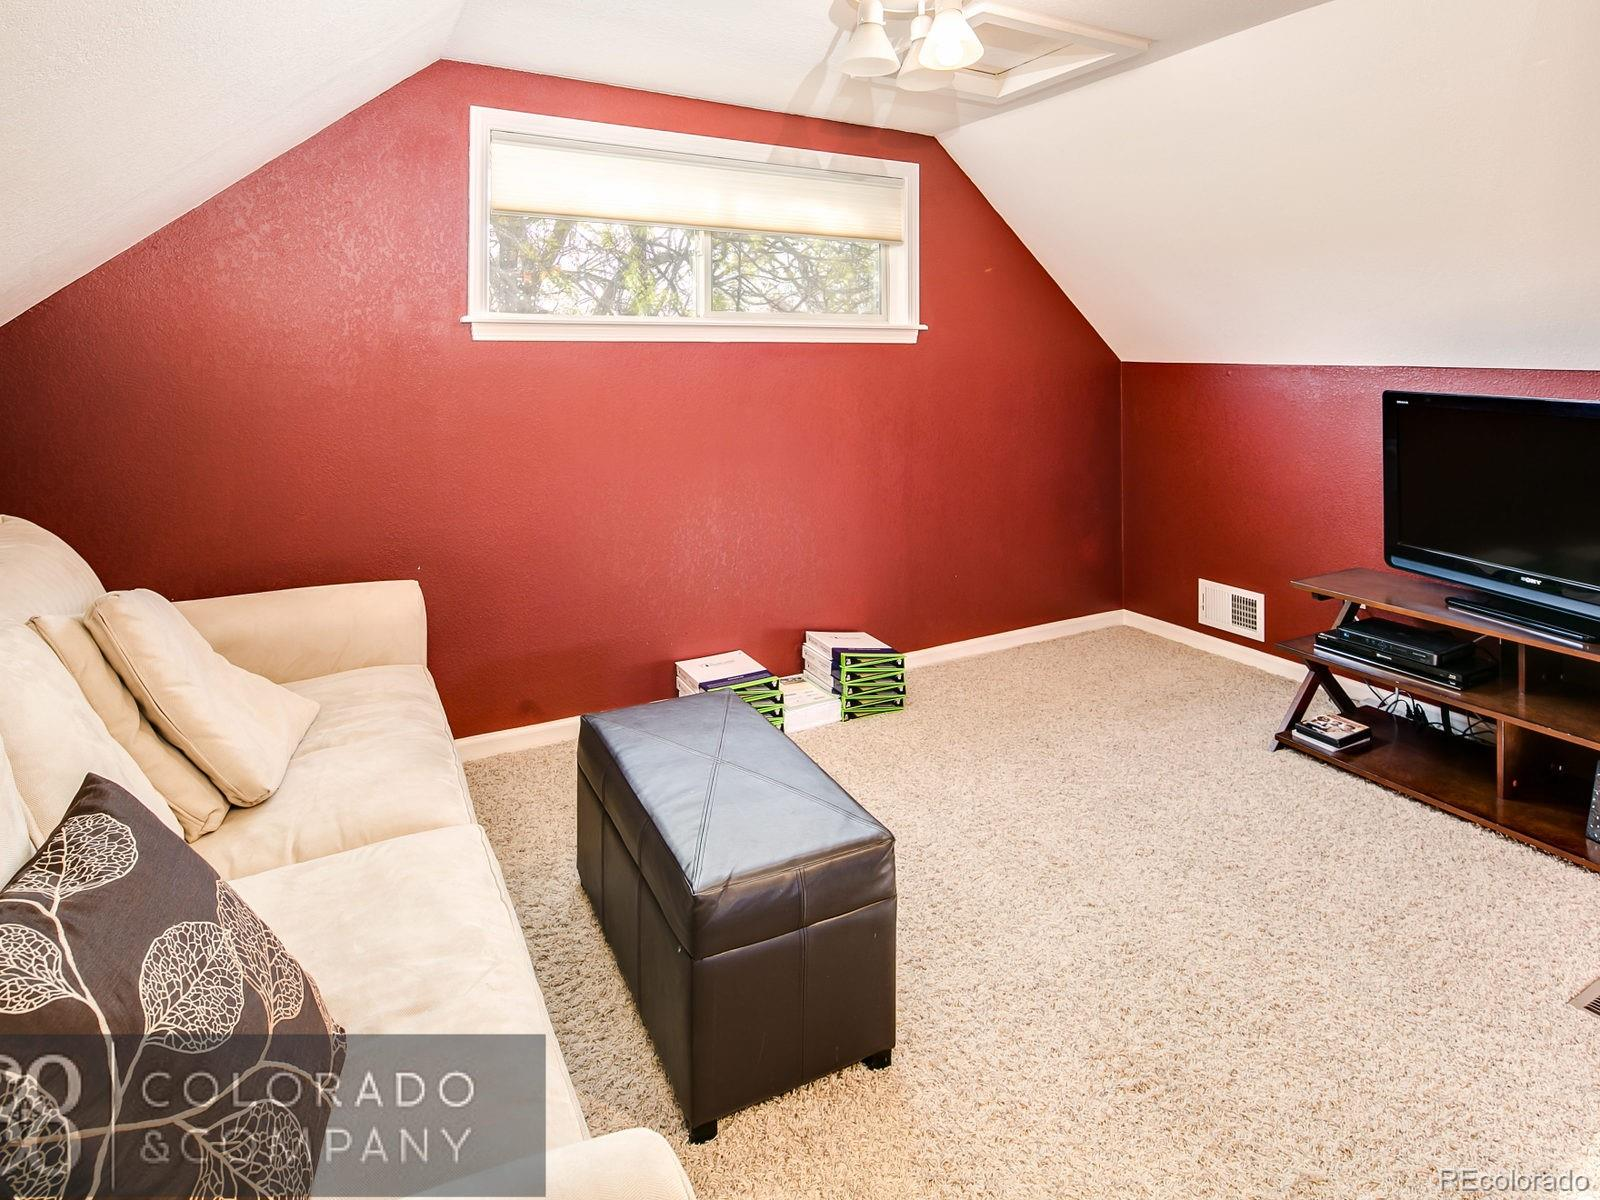 MLS# 9945288 - 15 - 4905 E 36th Avenue, Denver, CO 80207